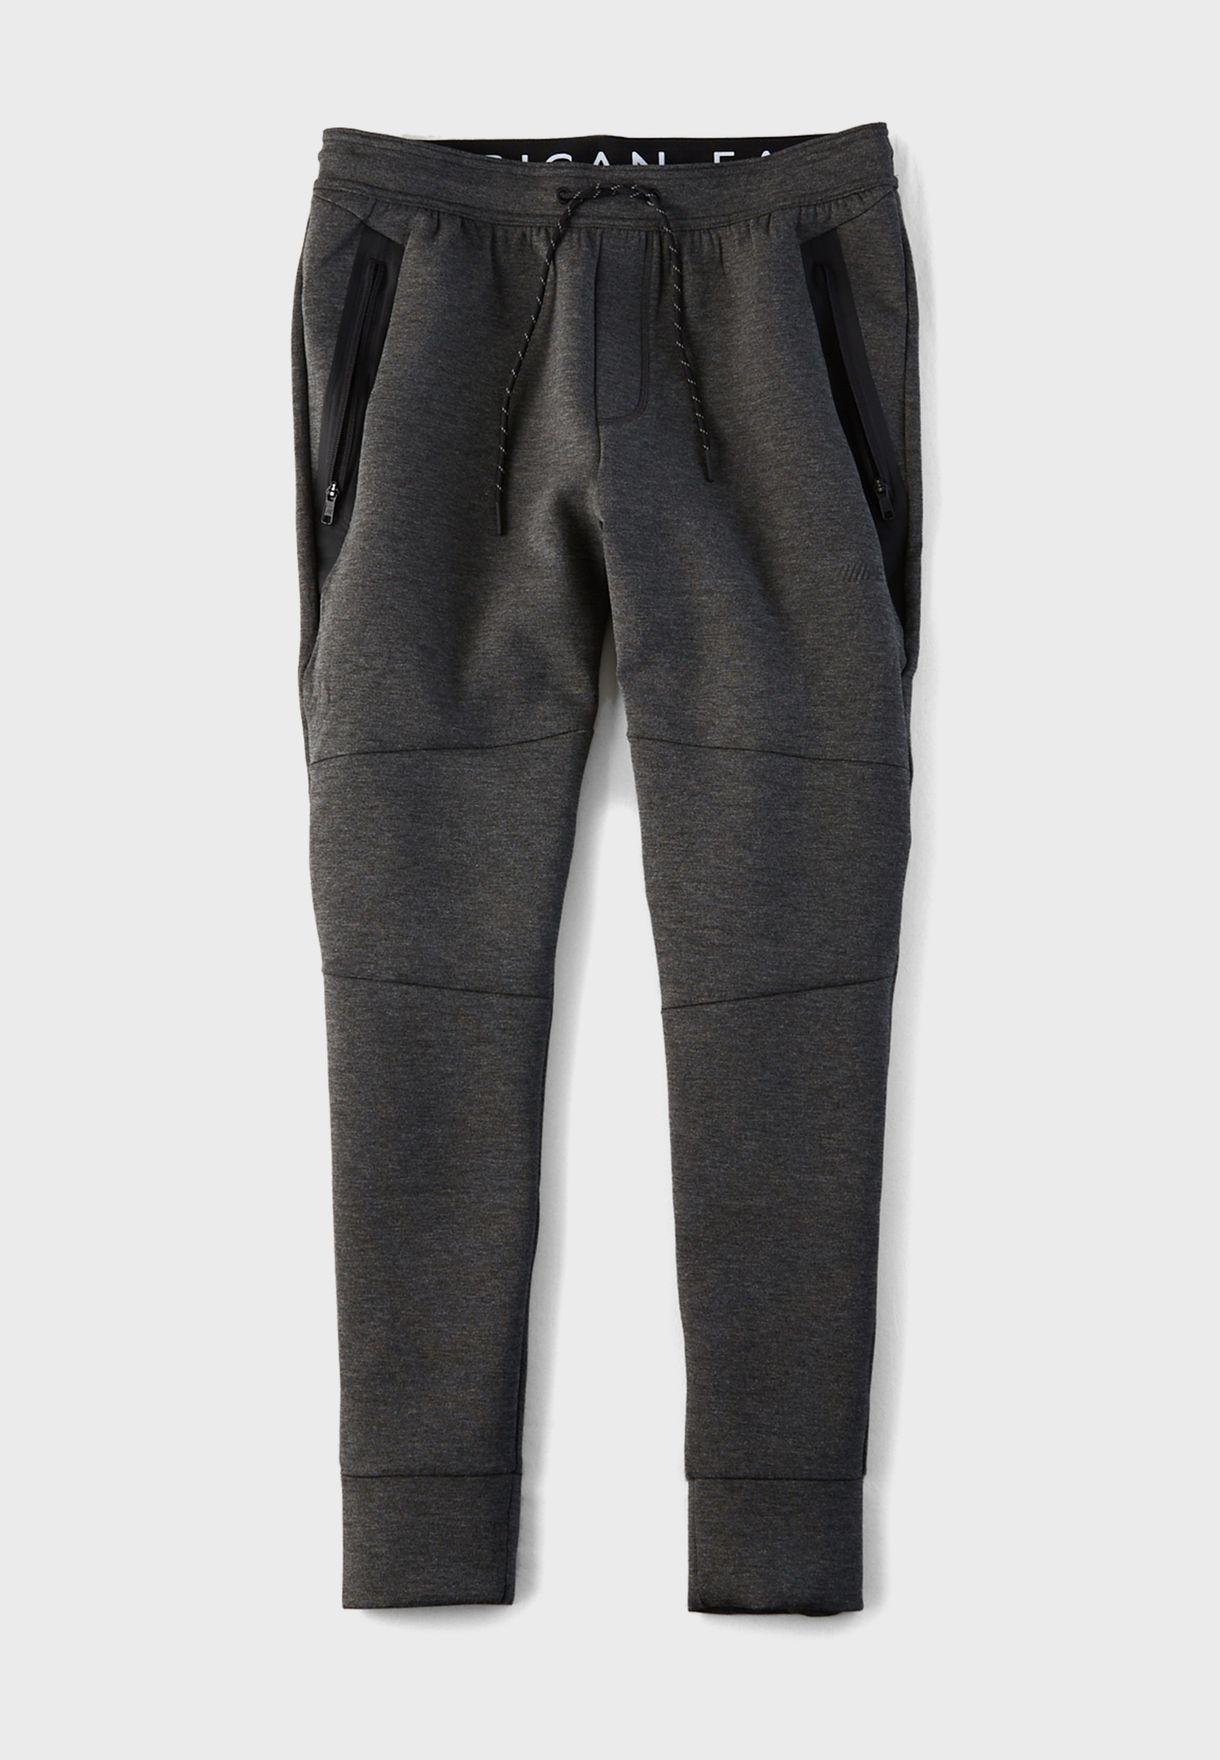 Zip Pocket Cuffed Sweatpants